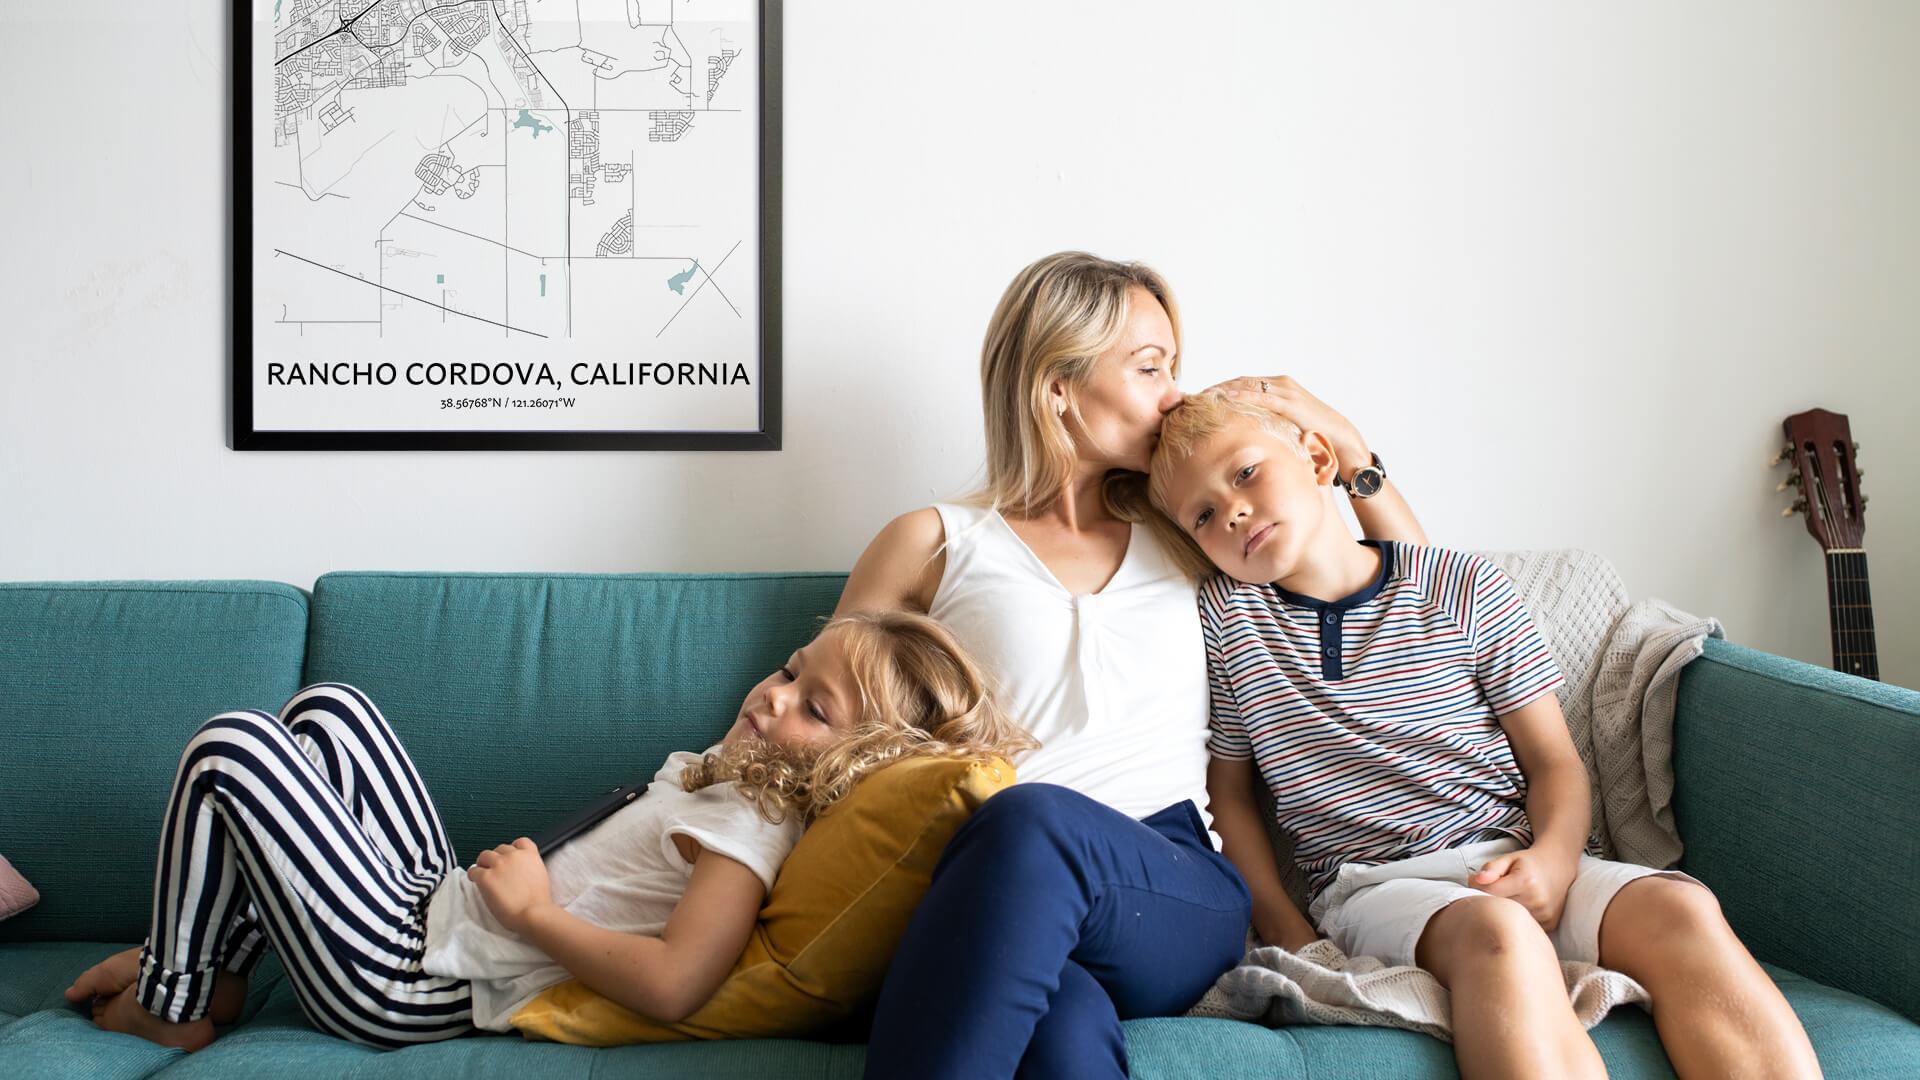 Rancho Cordova map poster